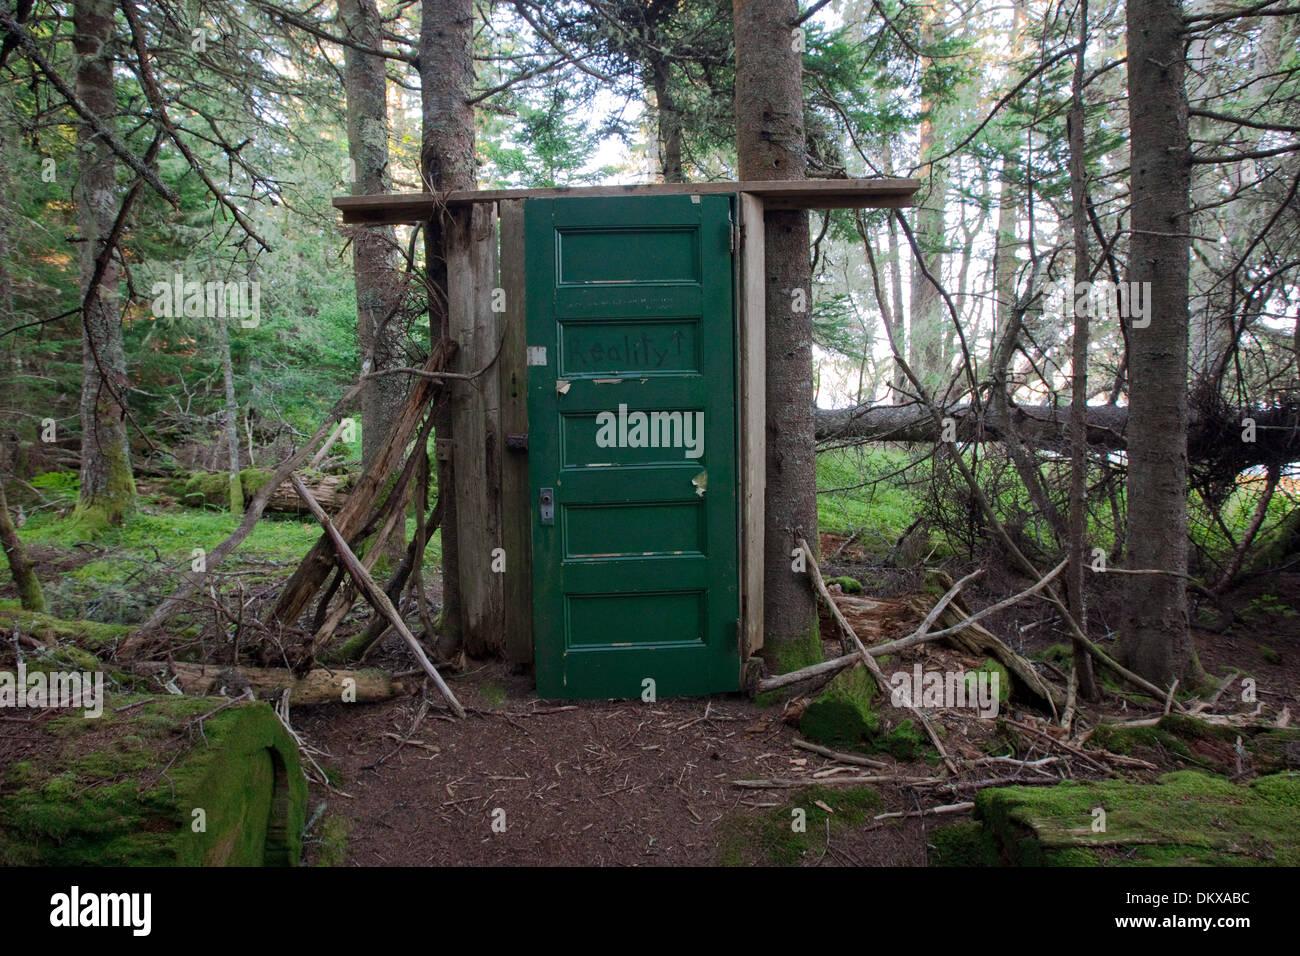 Green Door in the Forest, Buckle Island, Maine - Stock Image